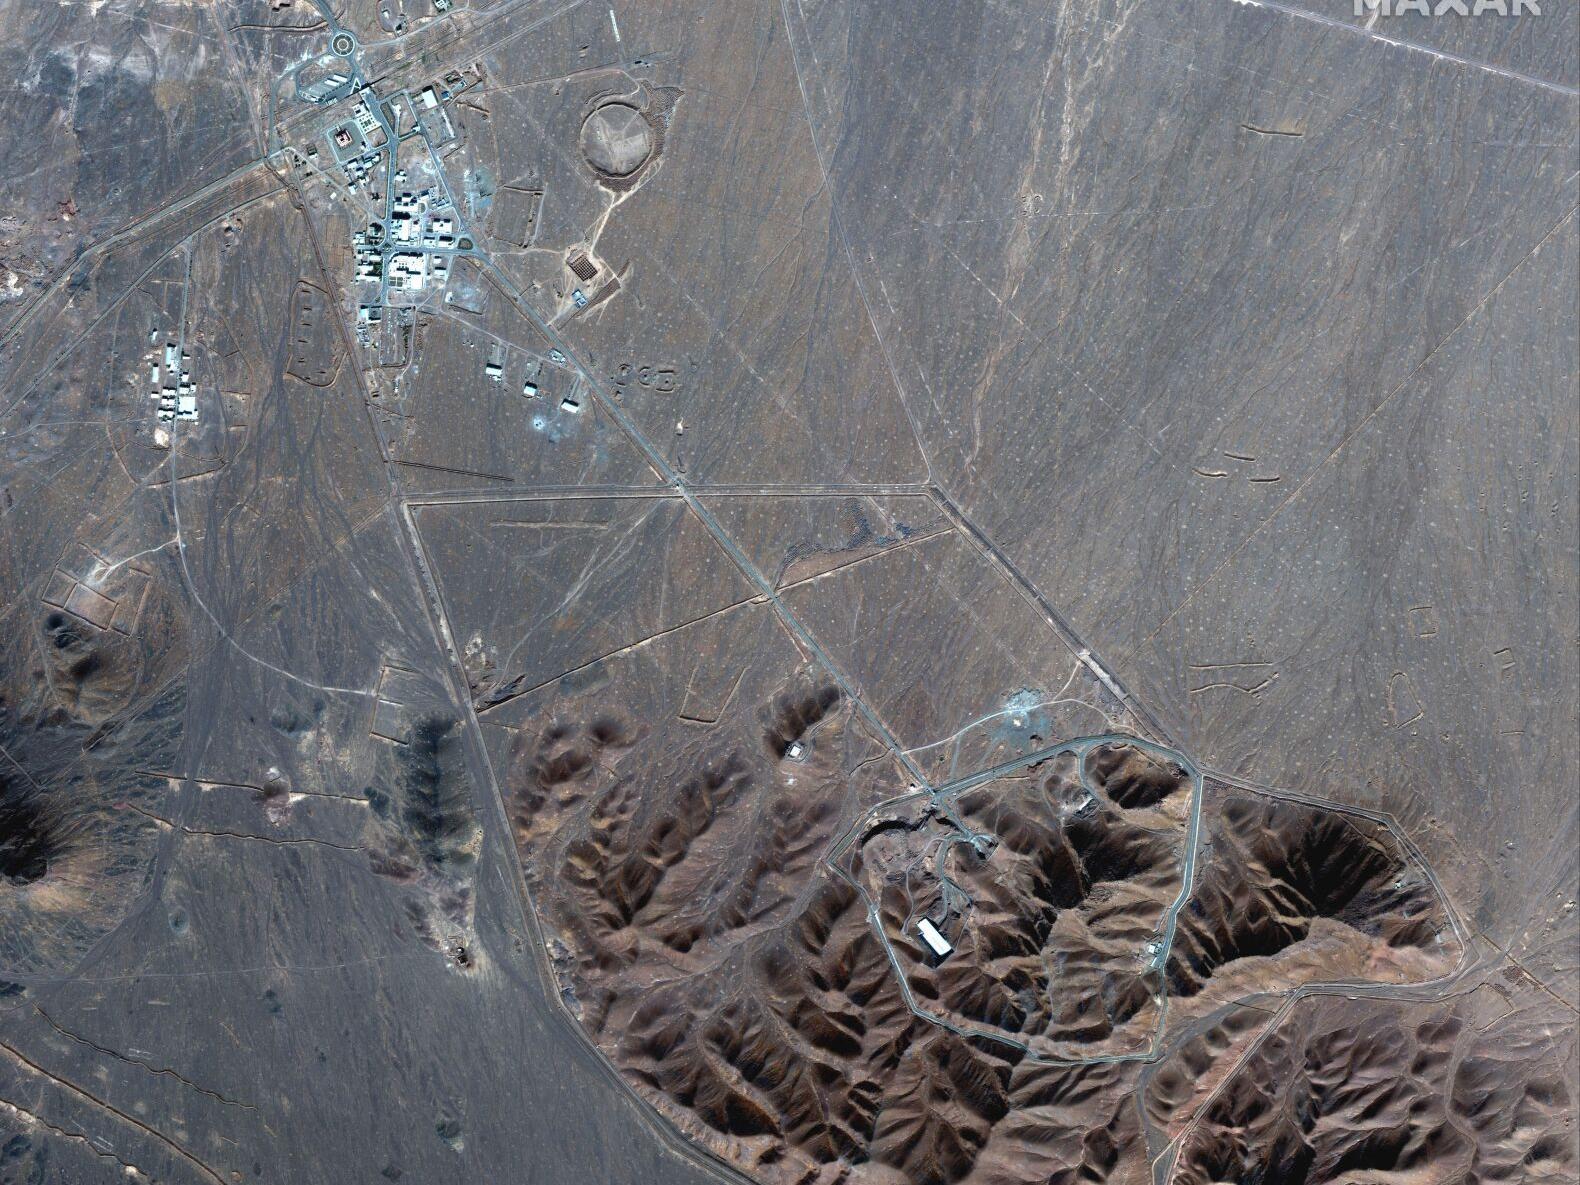 Iran starts producing 20 pct-enriched uranium: spokesman